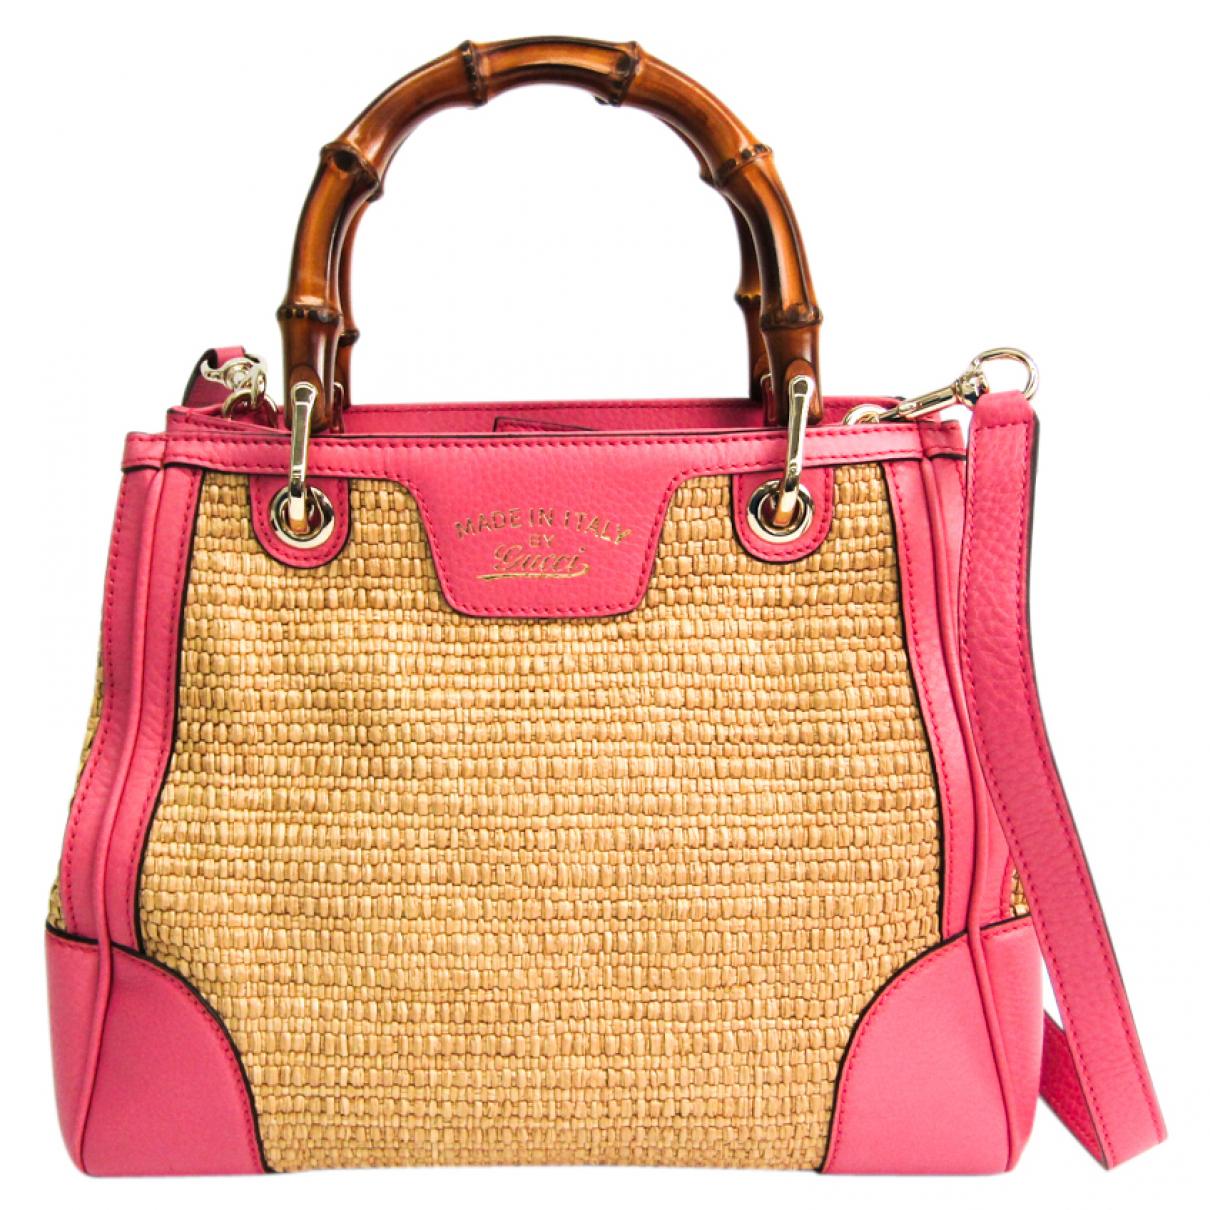 Gucci Bamboo Handtasche in  Beige Leder